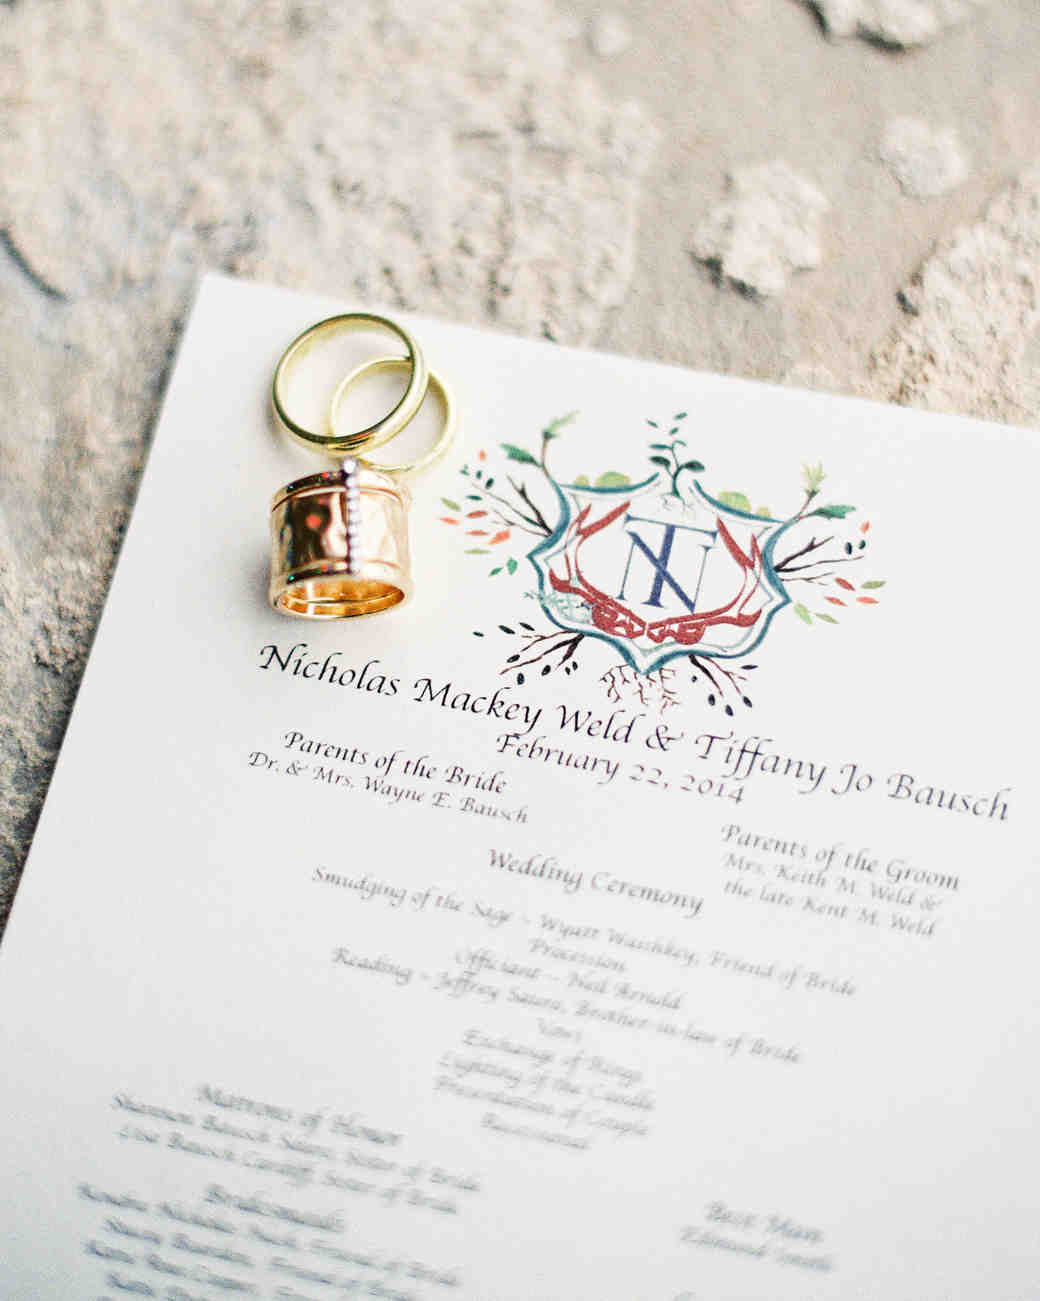 tiffany-nicholas-wedding-program2-013-s111339-0714.jpg